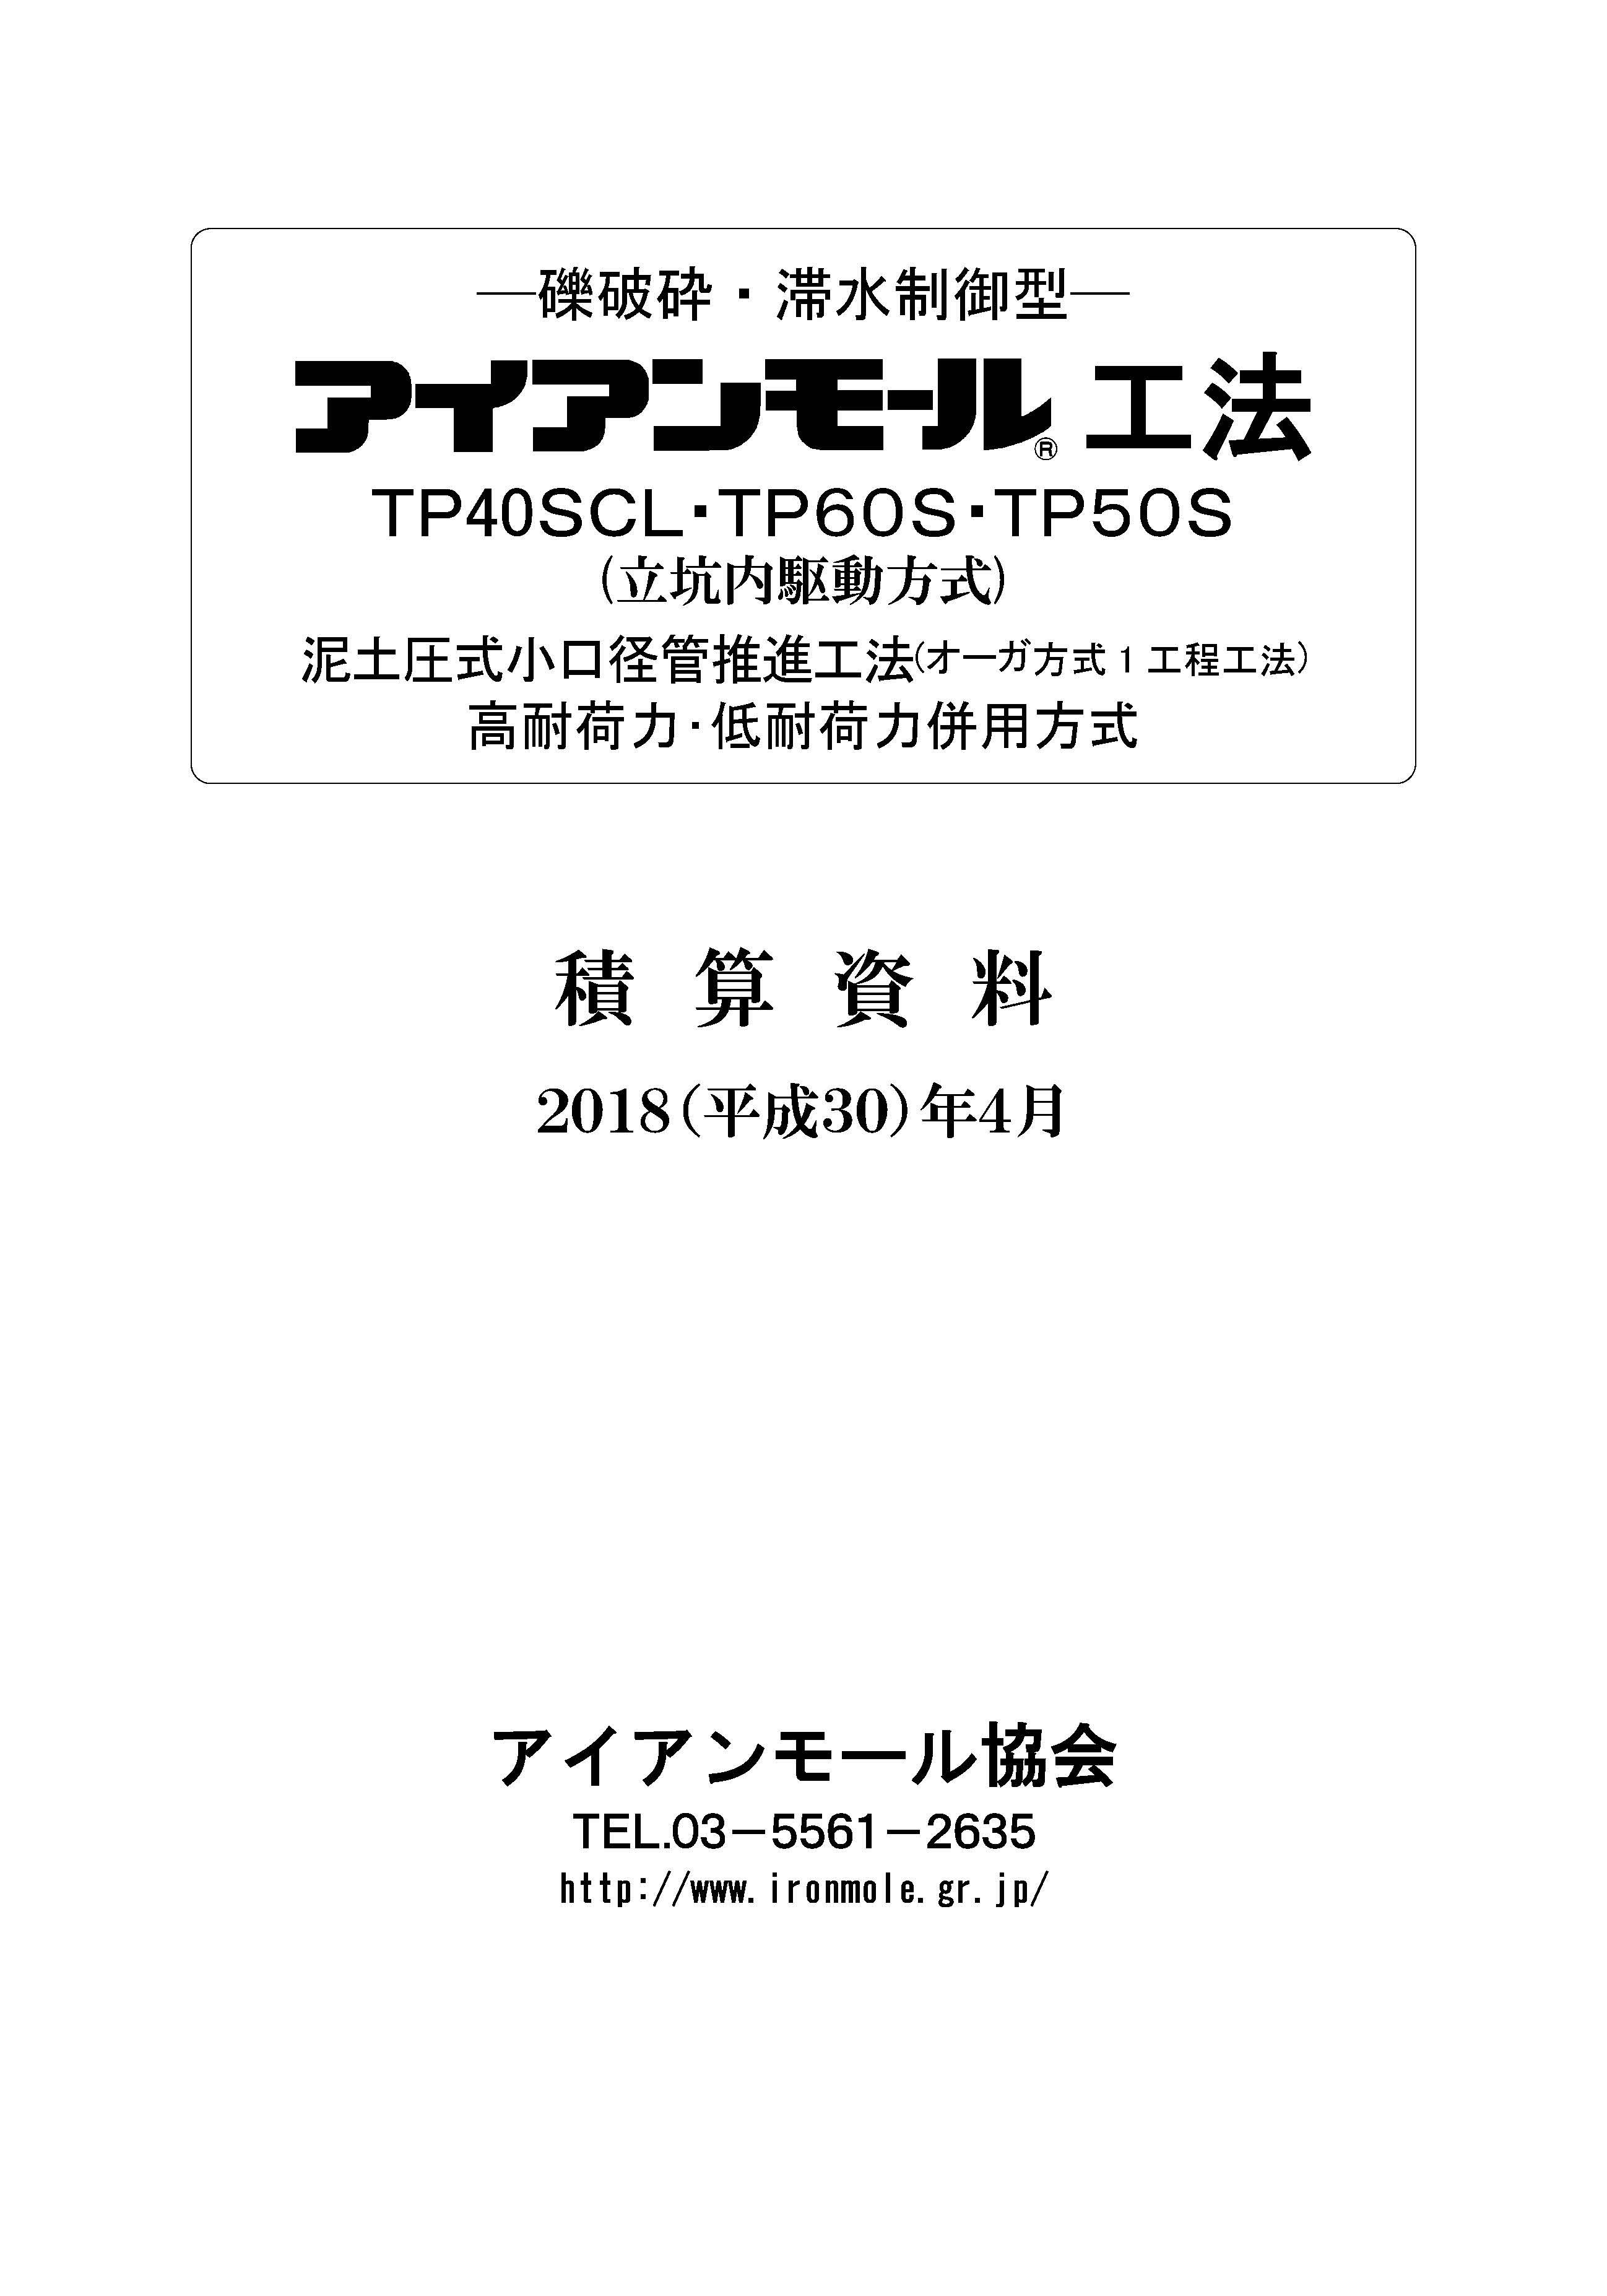 H30アイアンモール工法_TP40SCL・TP60S・TP50S_積算資料 1